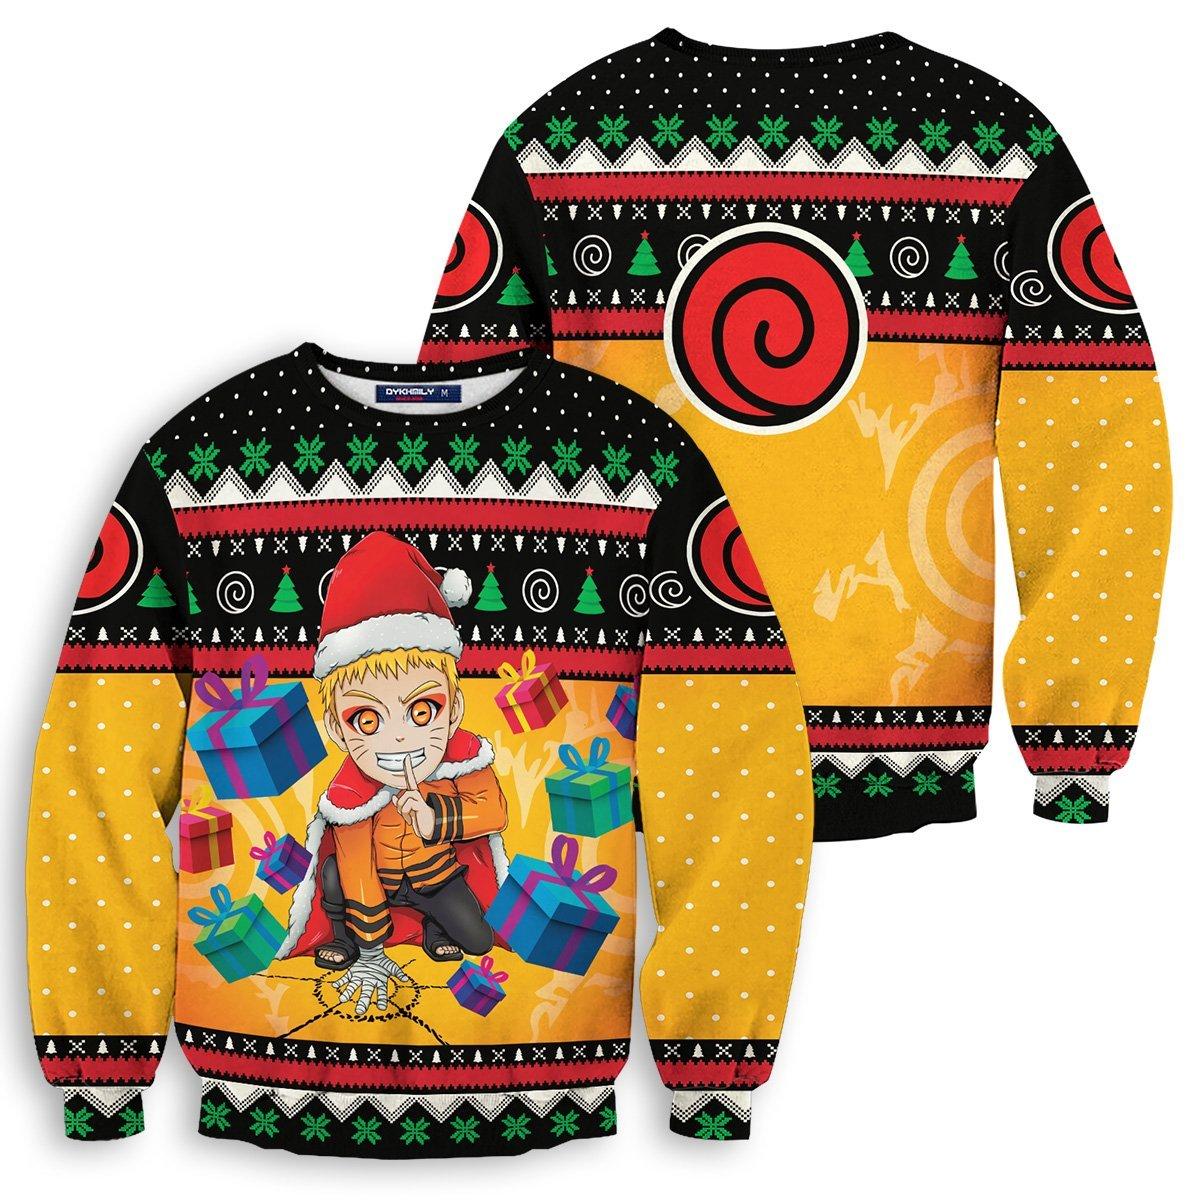 Uzumaki Holiday Way Unisex Wool Sweater FDM0310 S Official Otaku Treat Merch